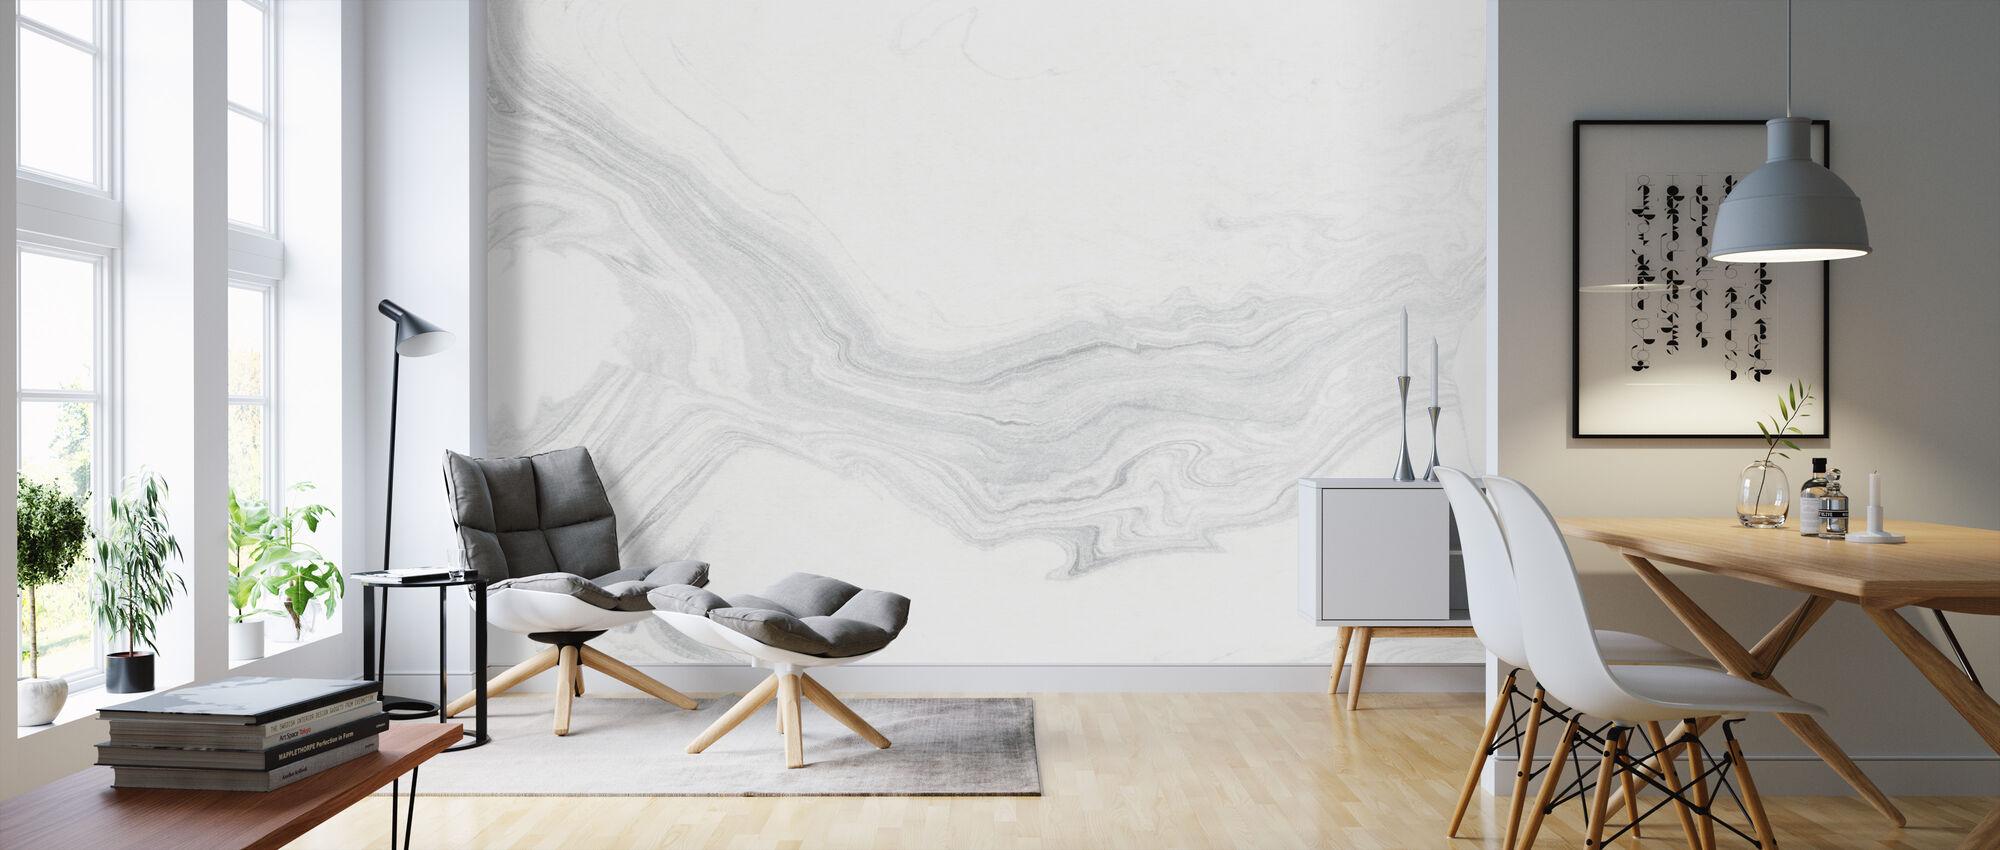 Suminagashi Marbling Kuro III - Wallpaper - Living Room